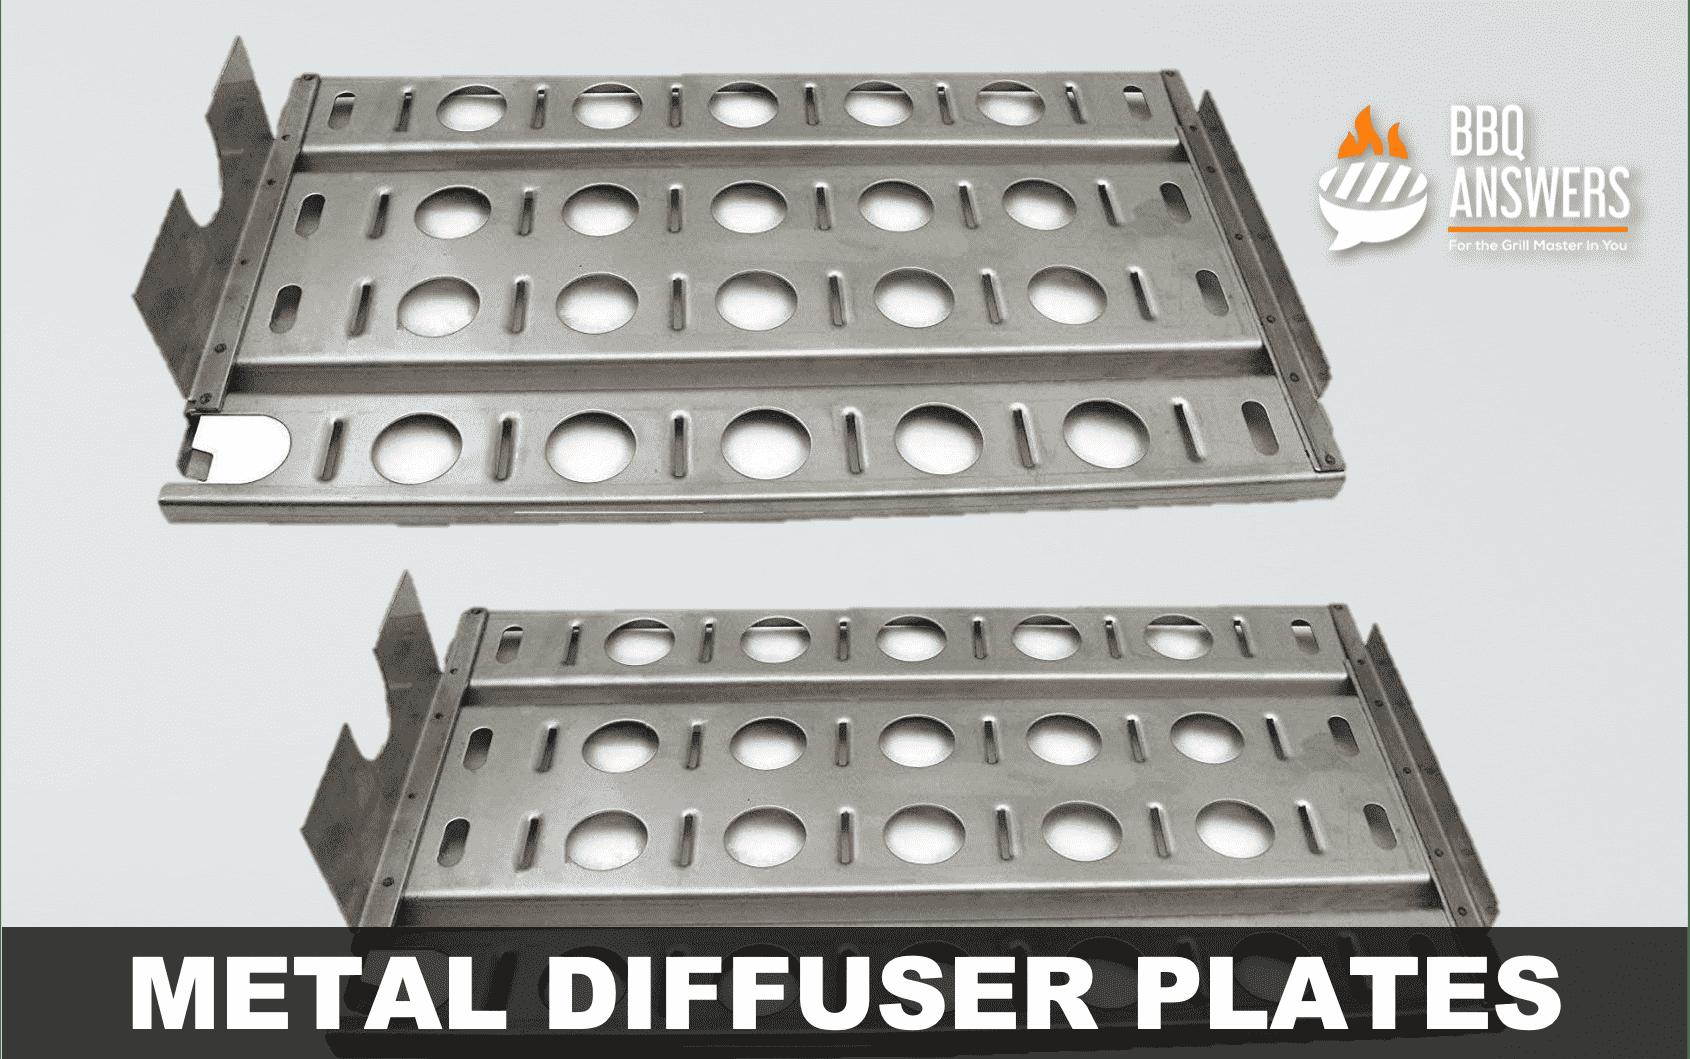 Metal Diffuser Plates   Types of BBQ Heat Diffuser   BBQanswers